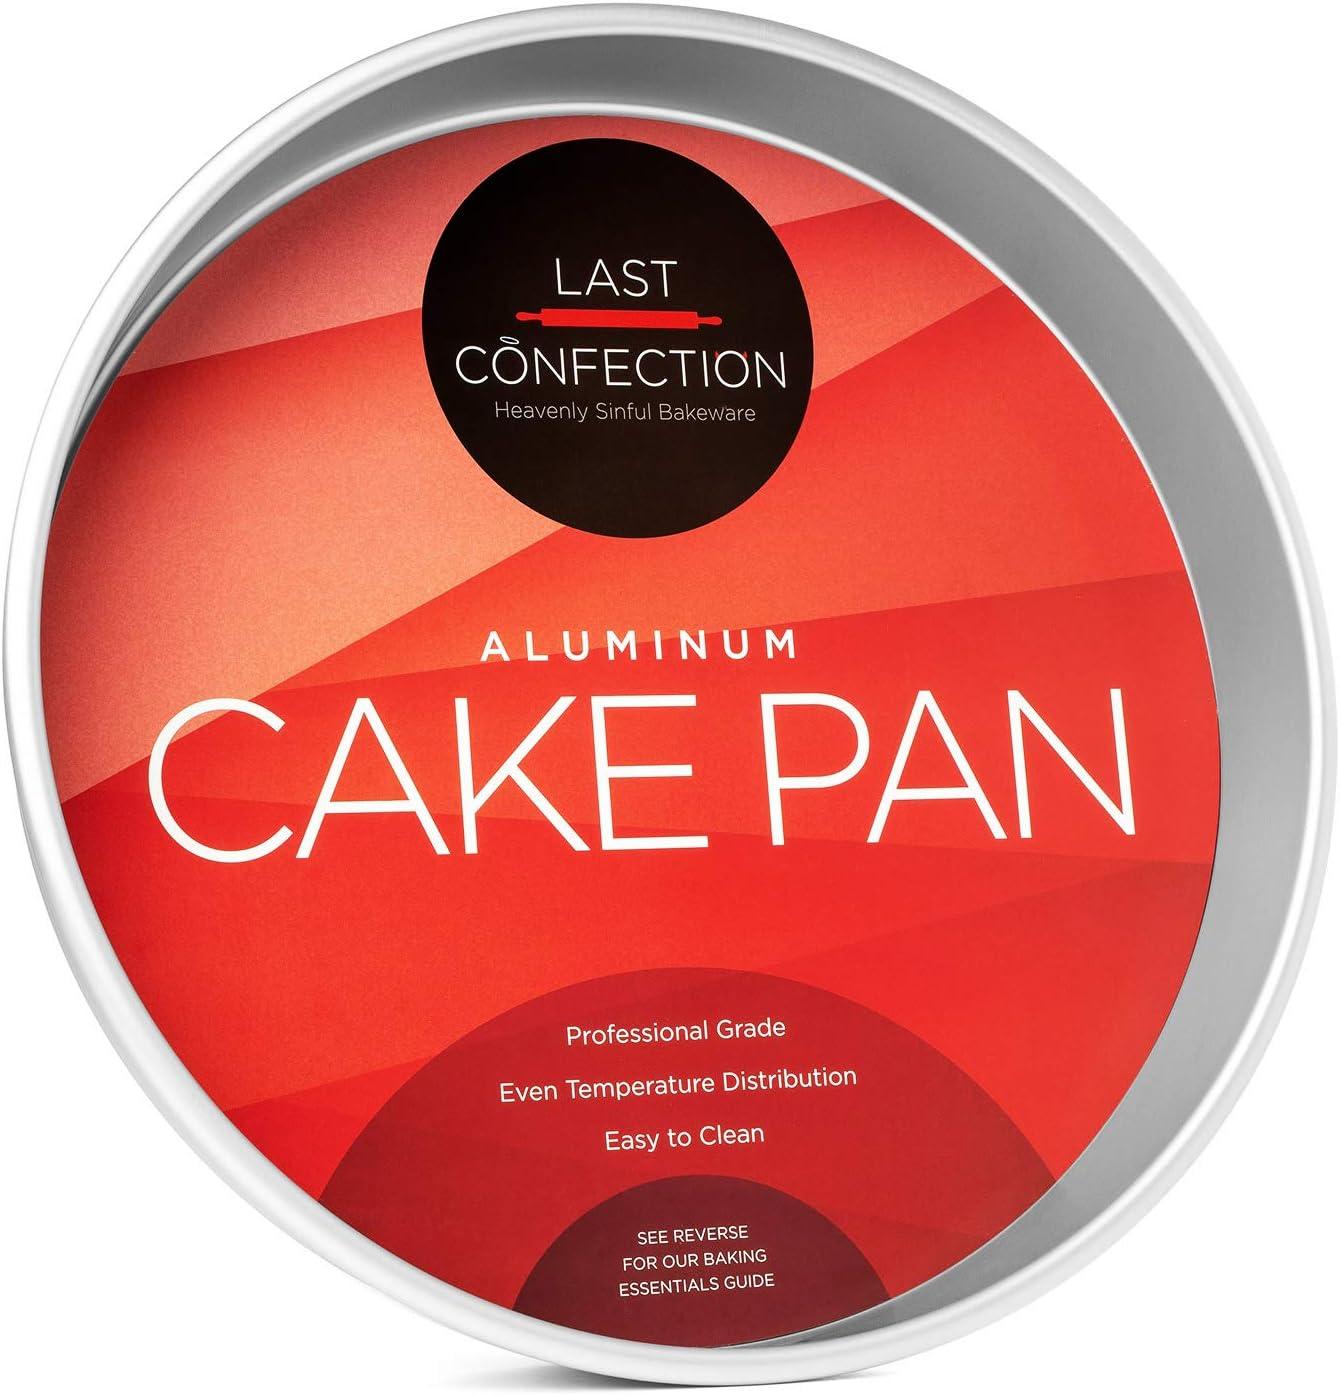 "Last Confection 12"" x 2"" Deep Round Aluminum Cake Pan - Professional Bakeware"